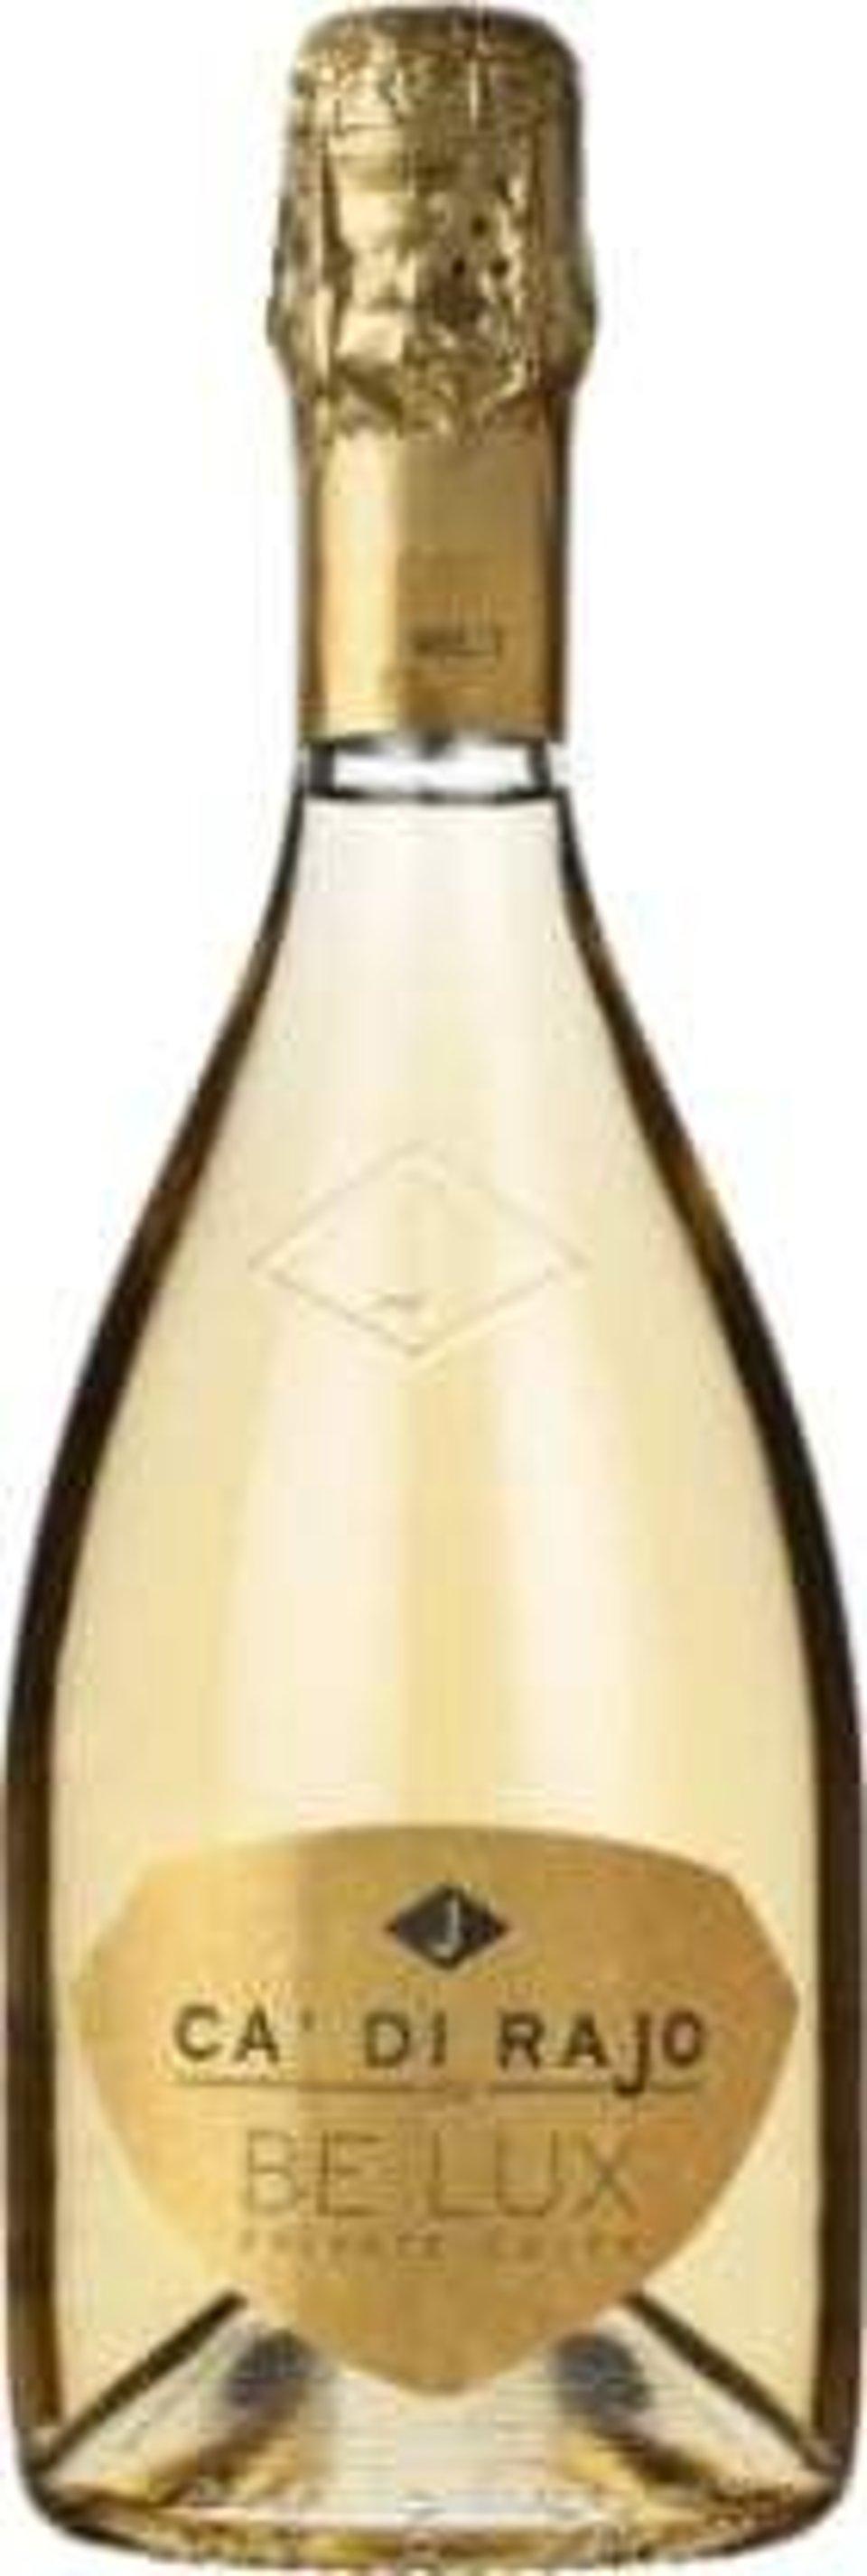 Ca'Di Rajo Be Lux Spumante Chardonnay 75CL #1